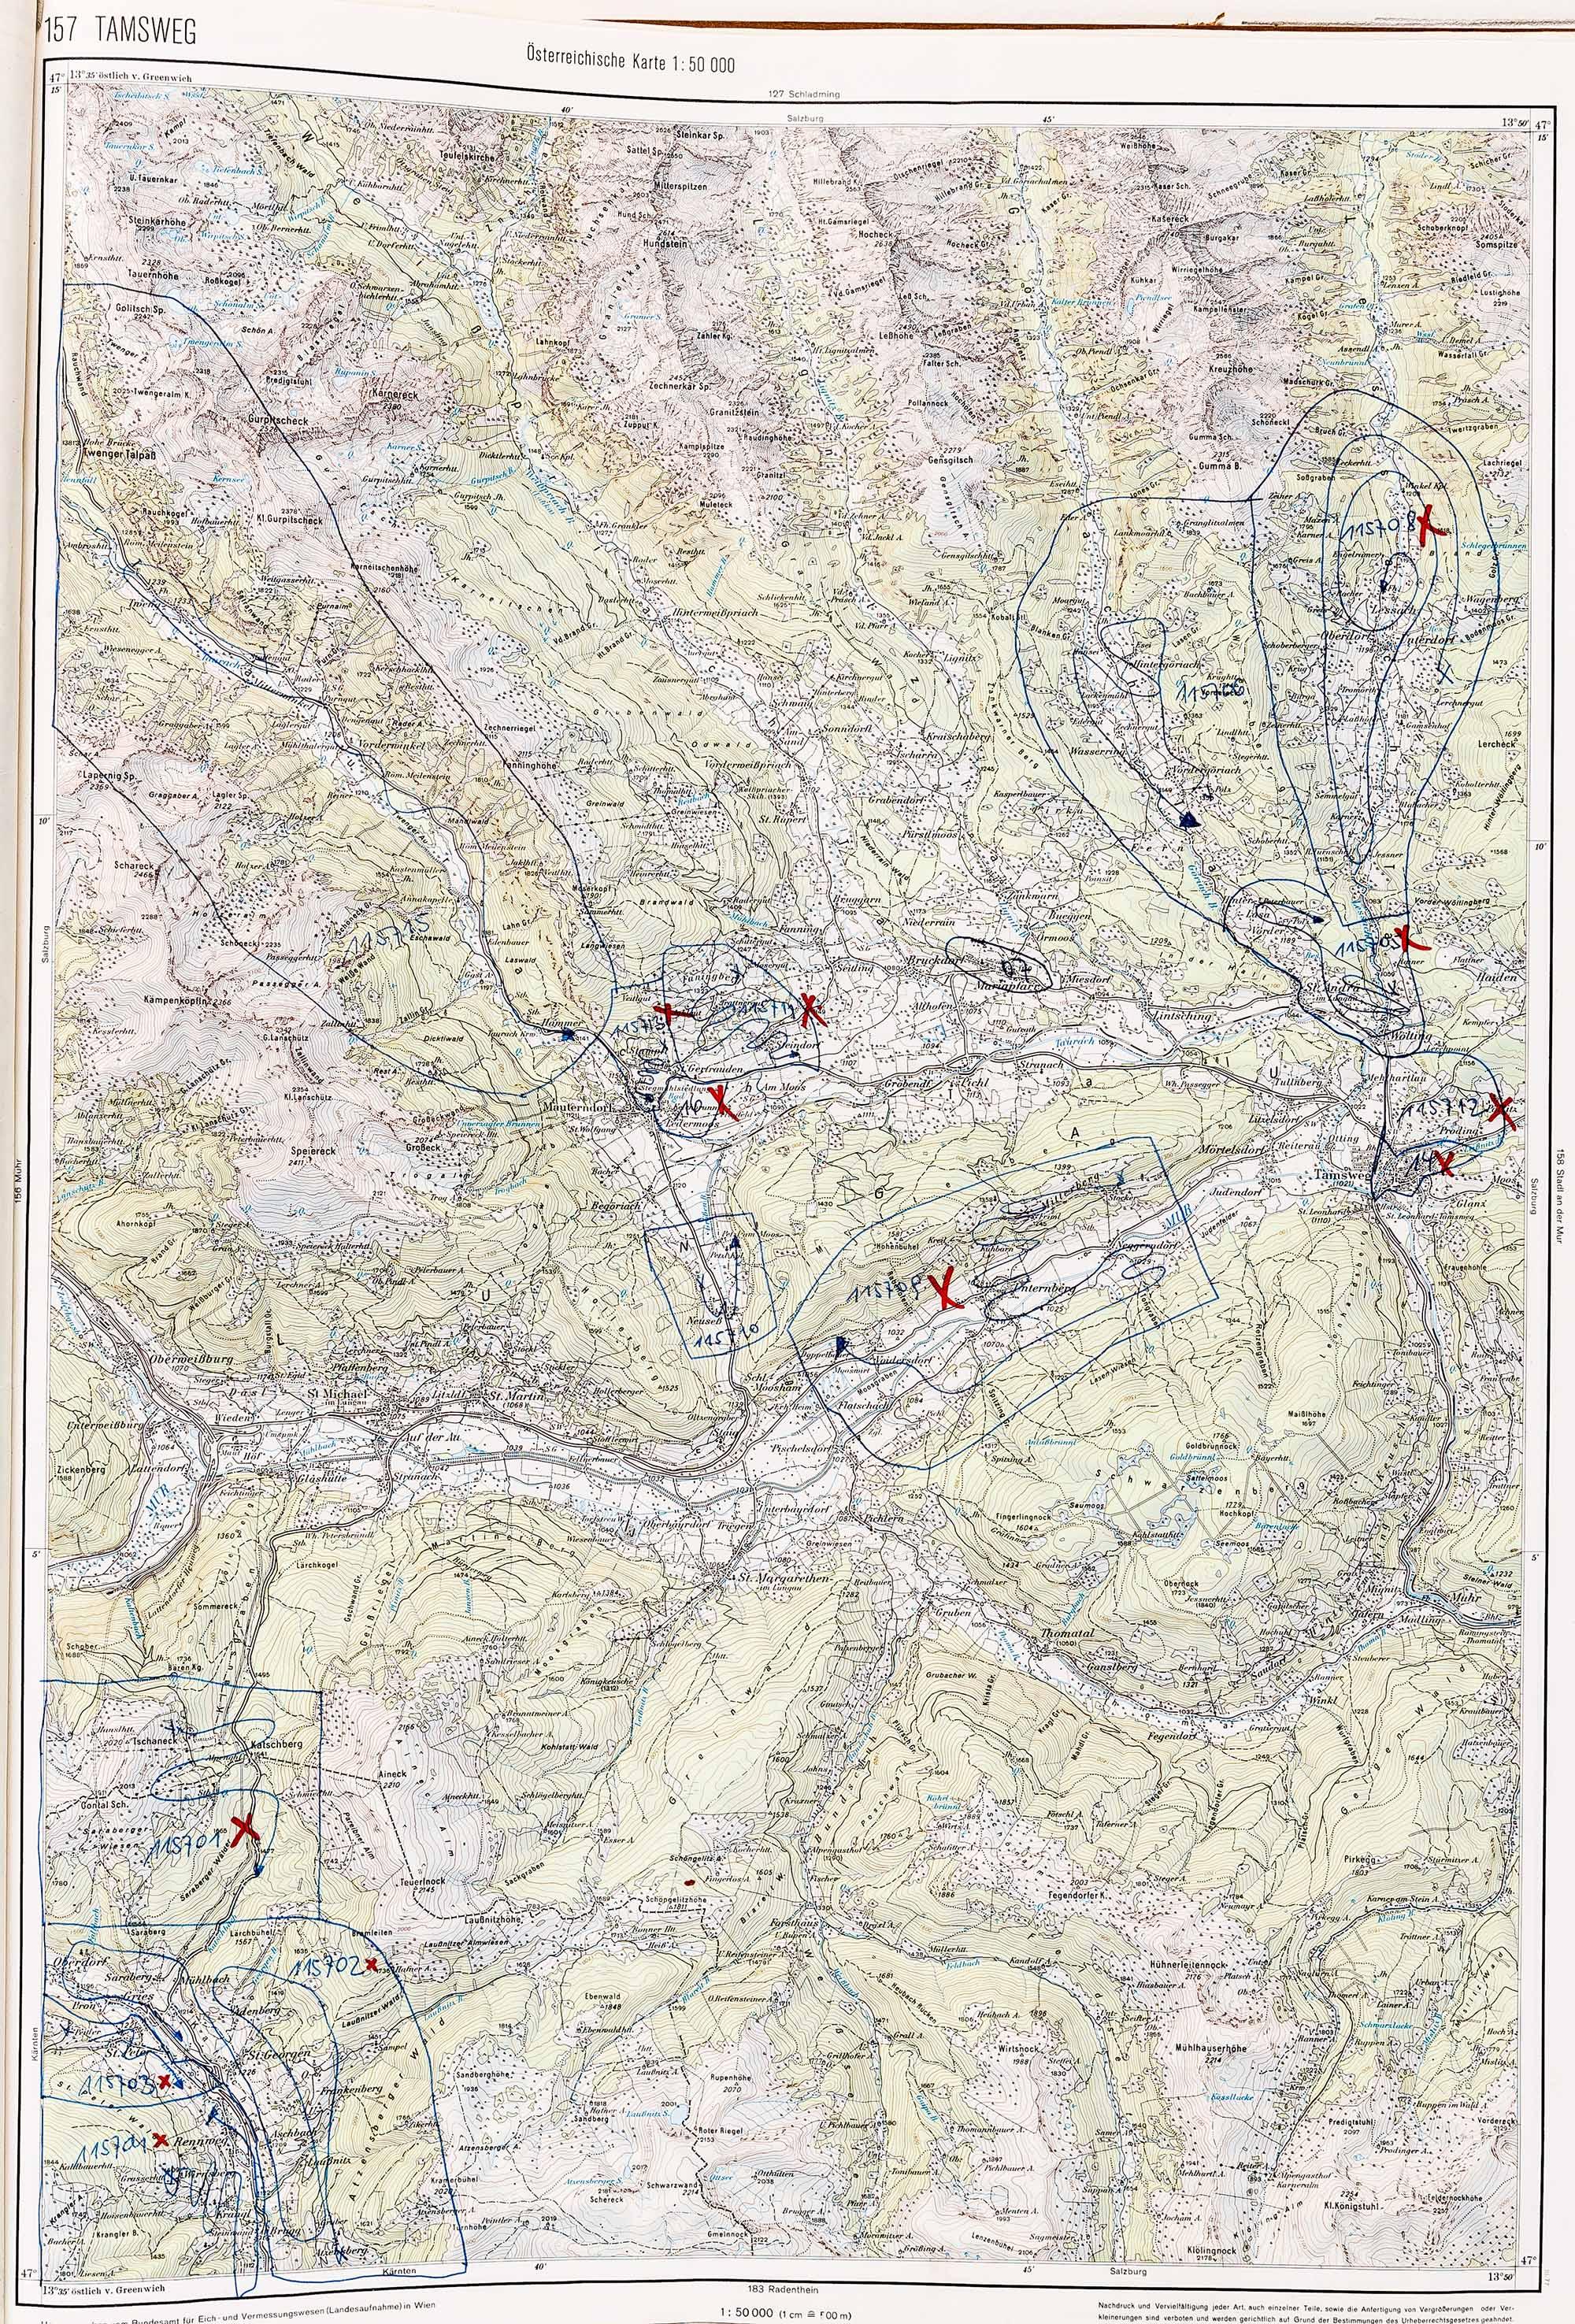 1979-1982 Karte 157